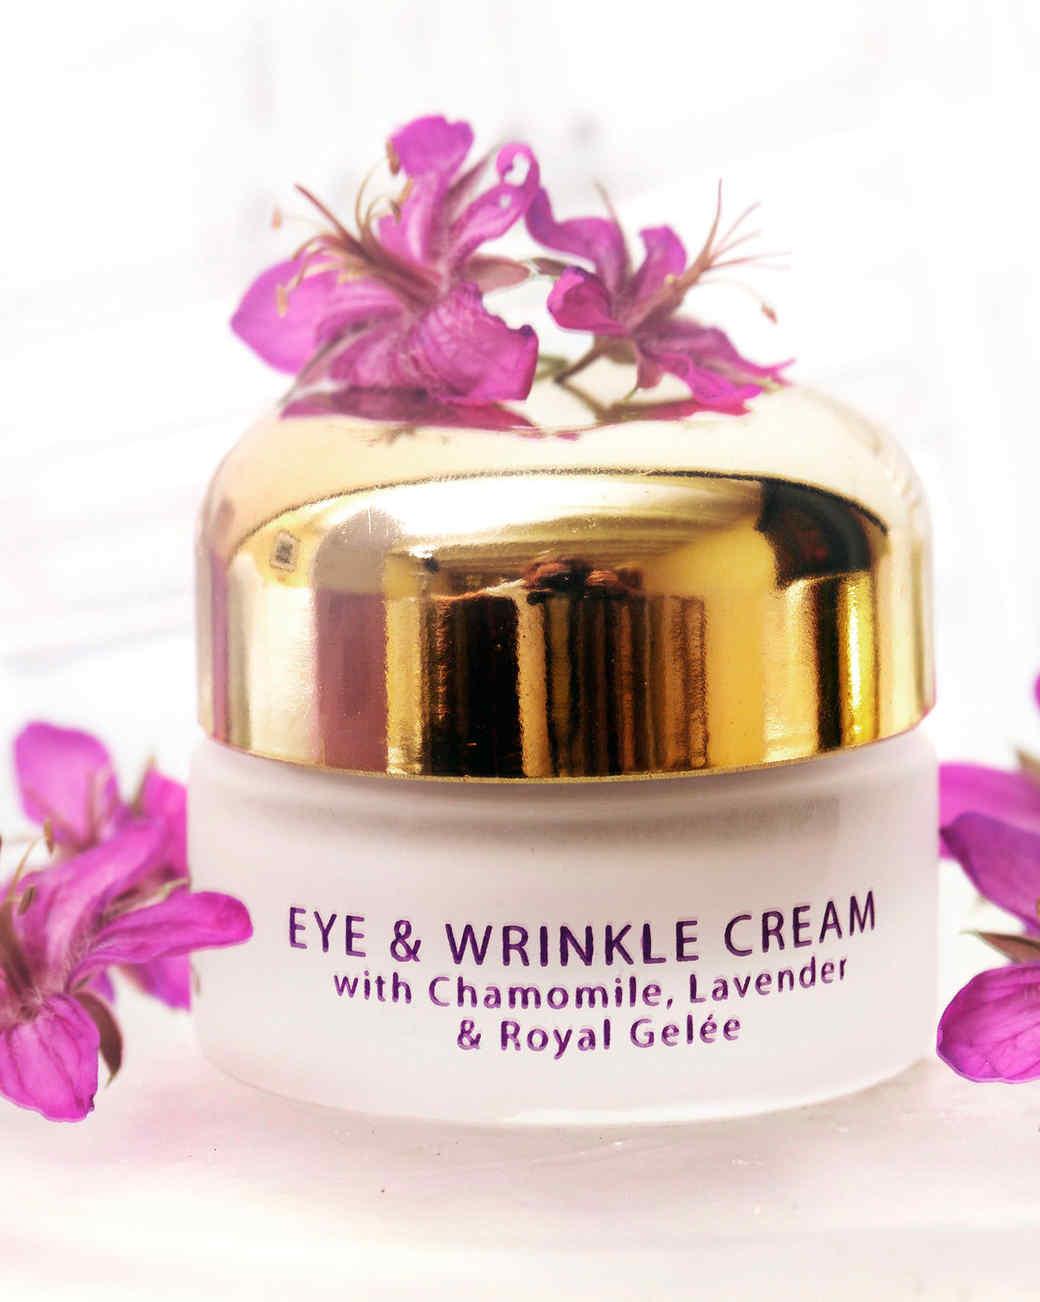 susan-ciminelli-eye-and-wrinkle-cream-0915.jpg